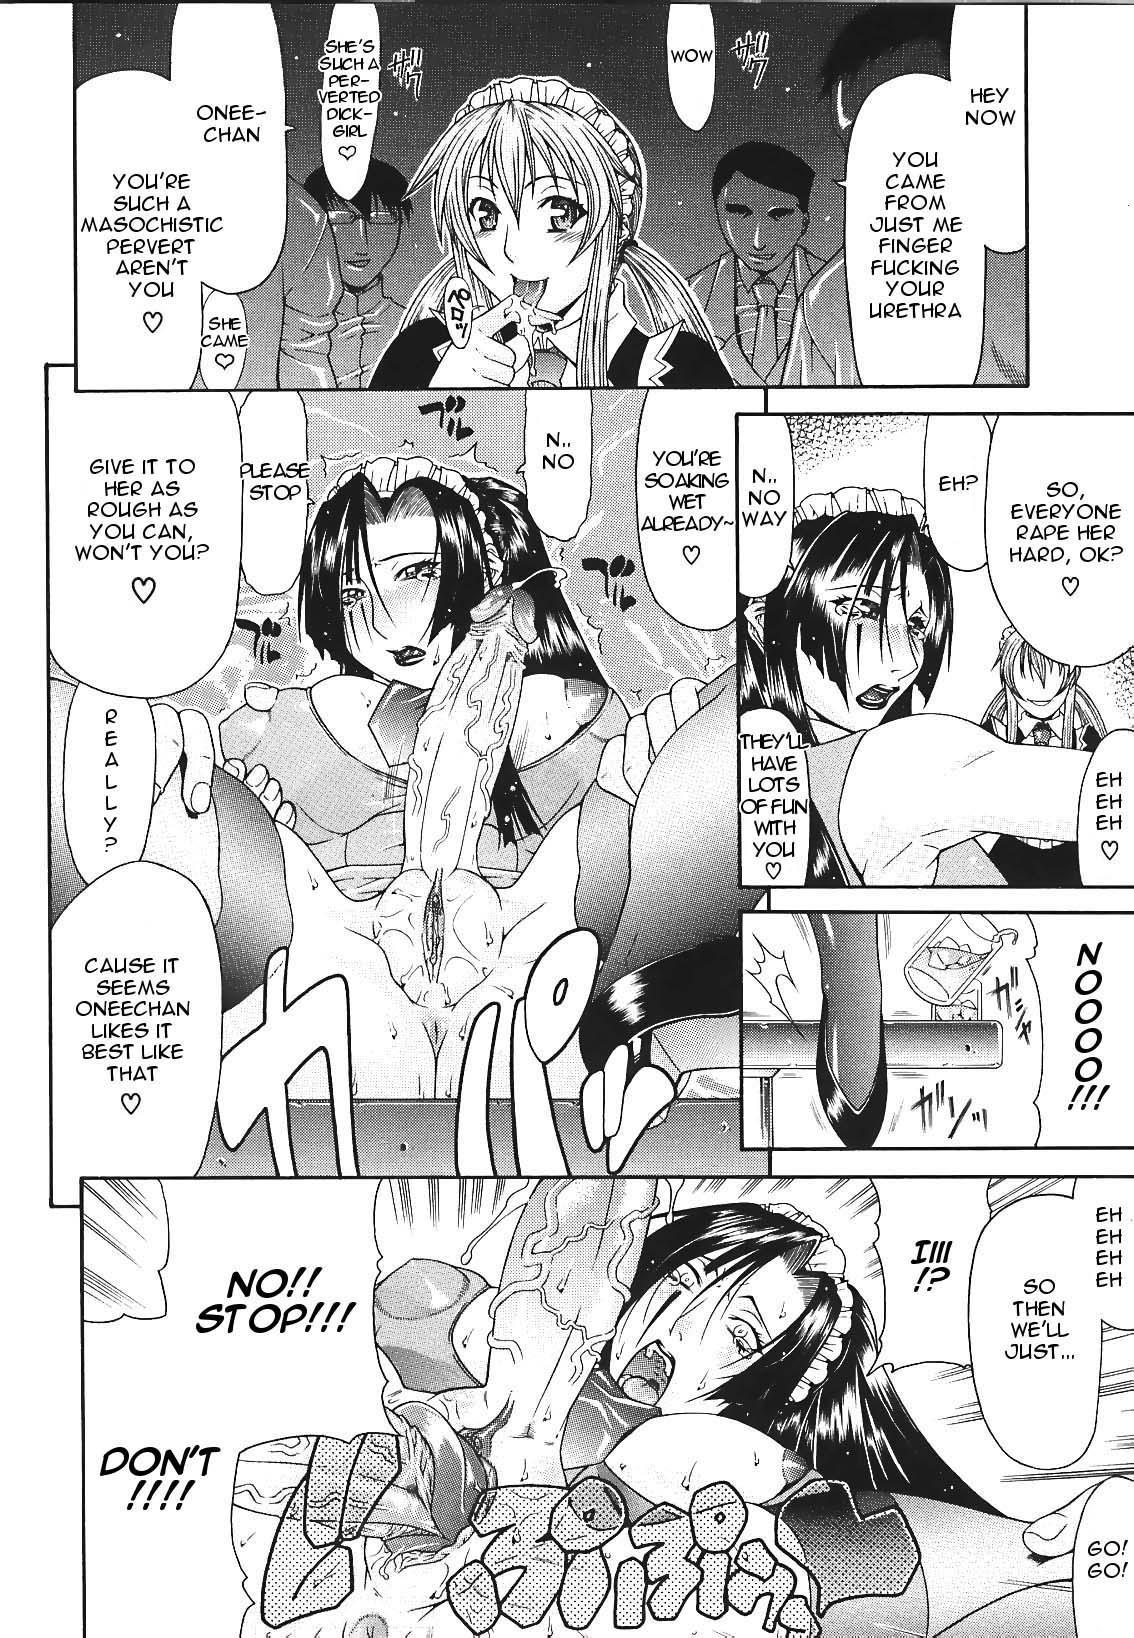 Gura Nyuutou - Escape chapter 7 15